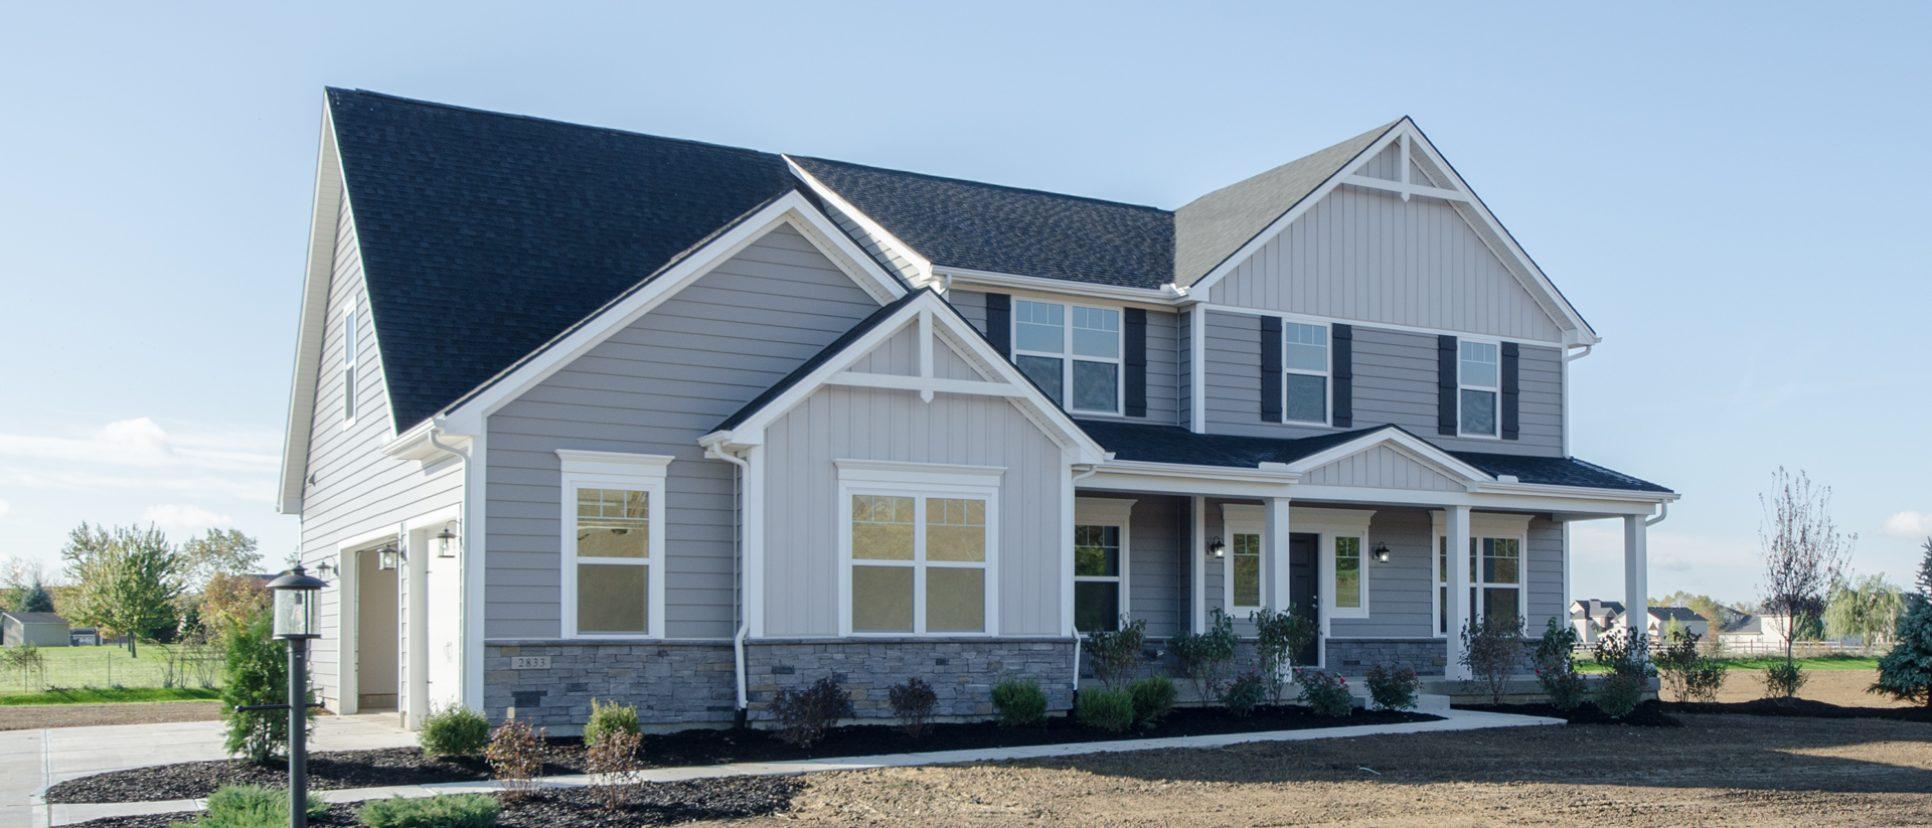 The Lexington, a market ready home by Design Homes an Development in Savannah Farms.